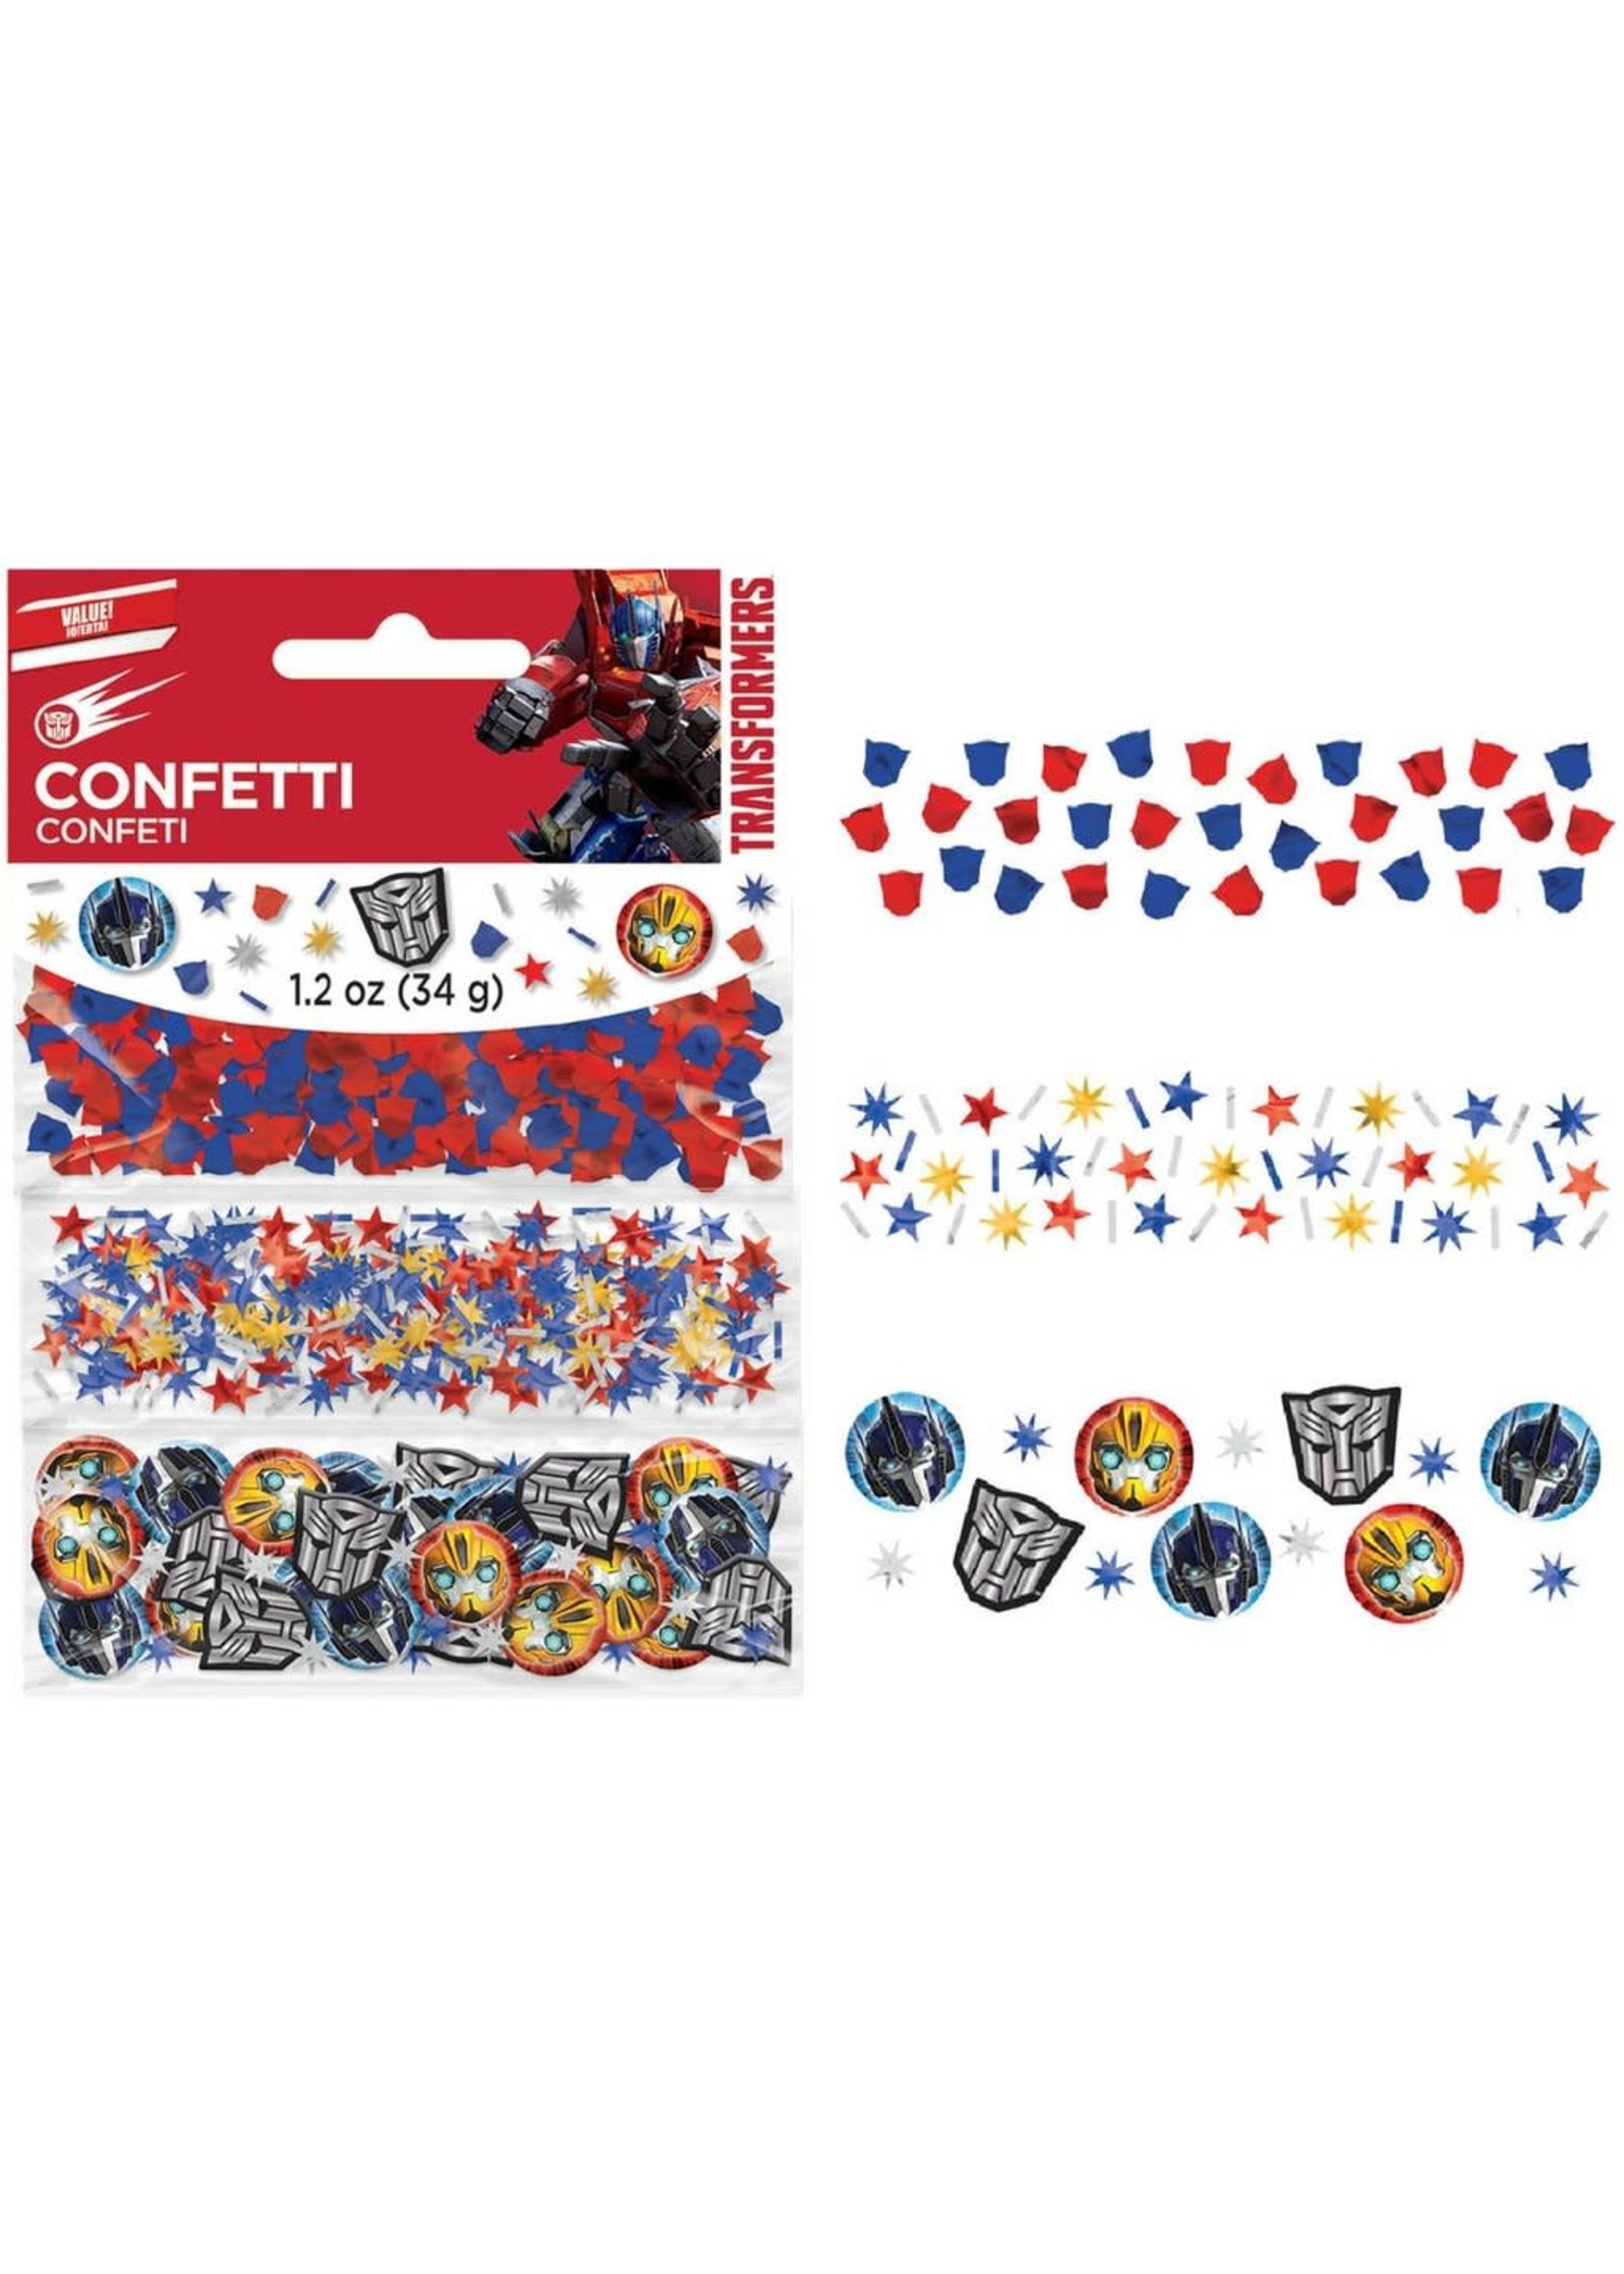 Transformers Confetti Pack